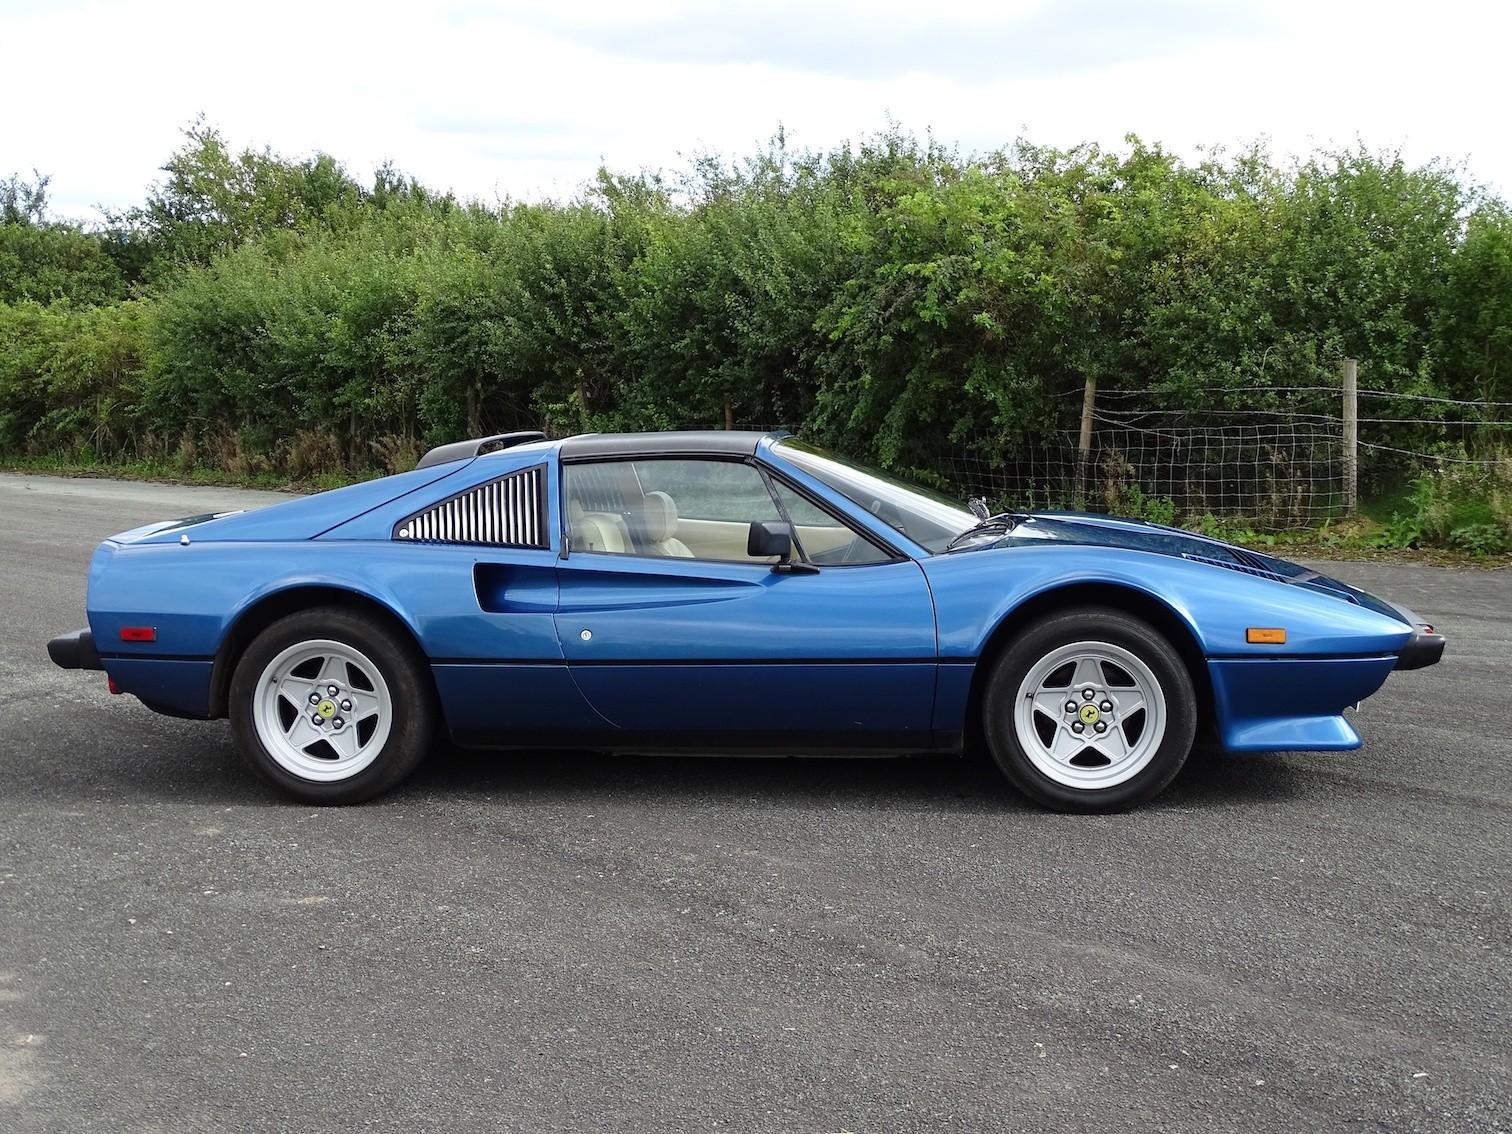 Iggy Pop S Rare Chiaro Blue Ferrari 308 Gts Qv That He Used To Let Off Steam Around Miami